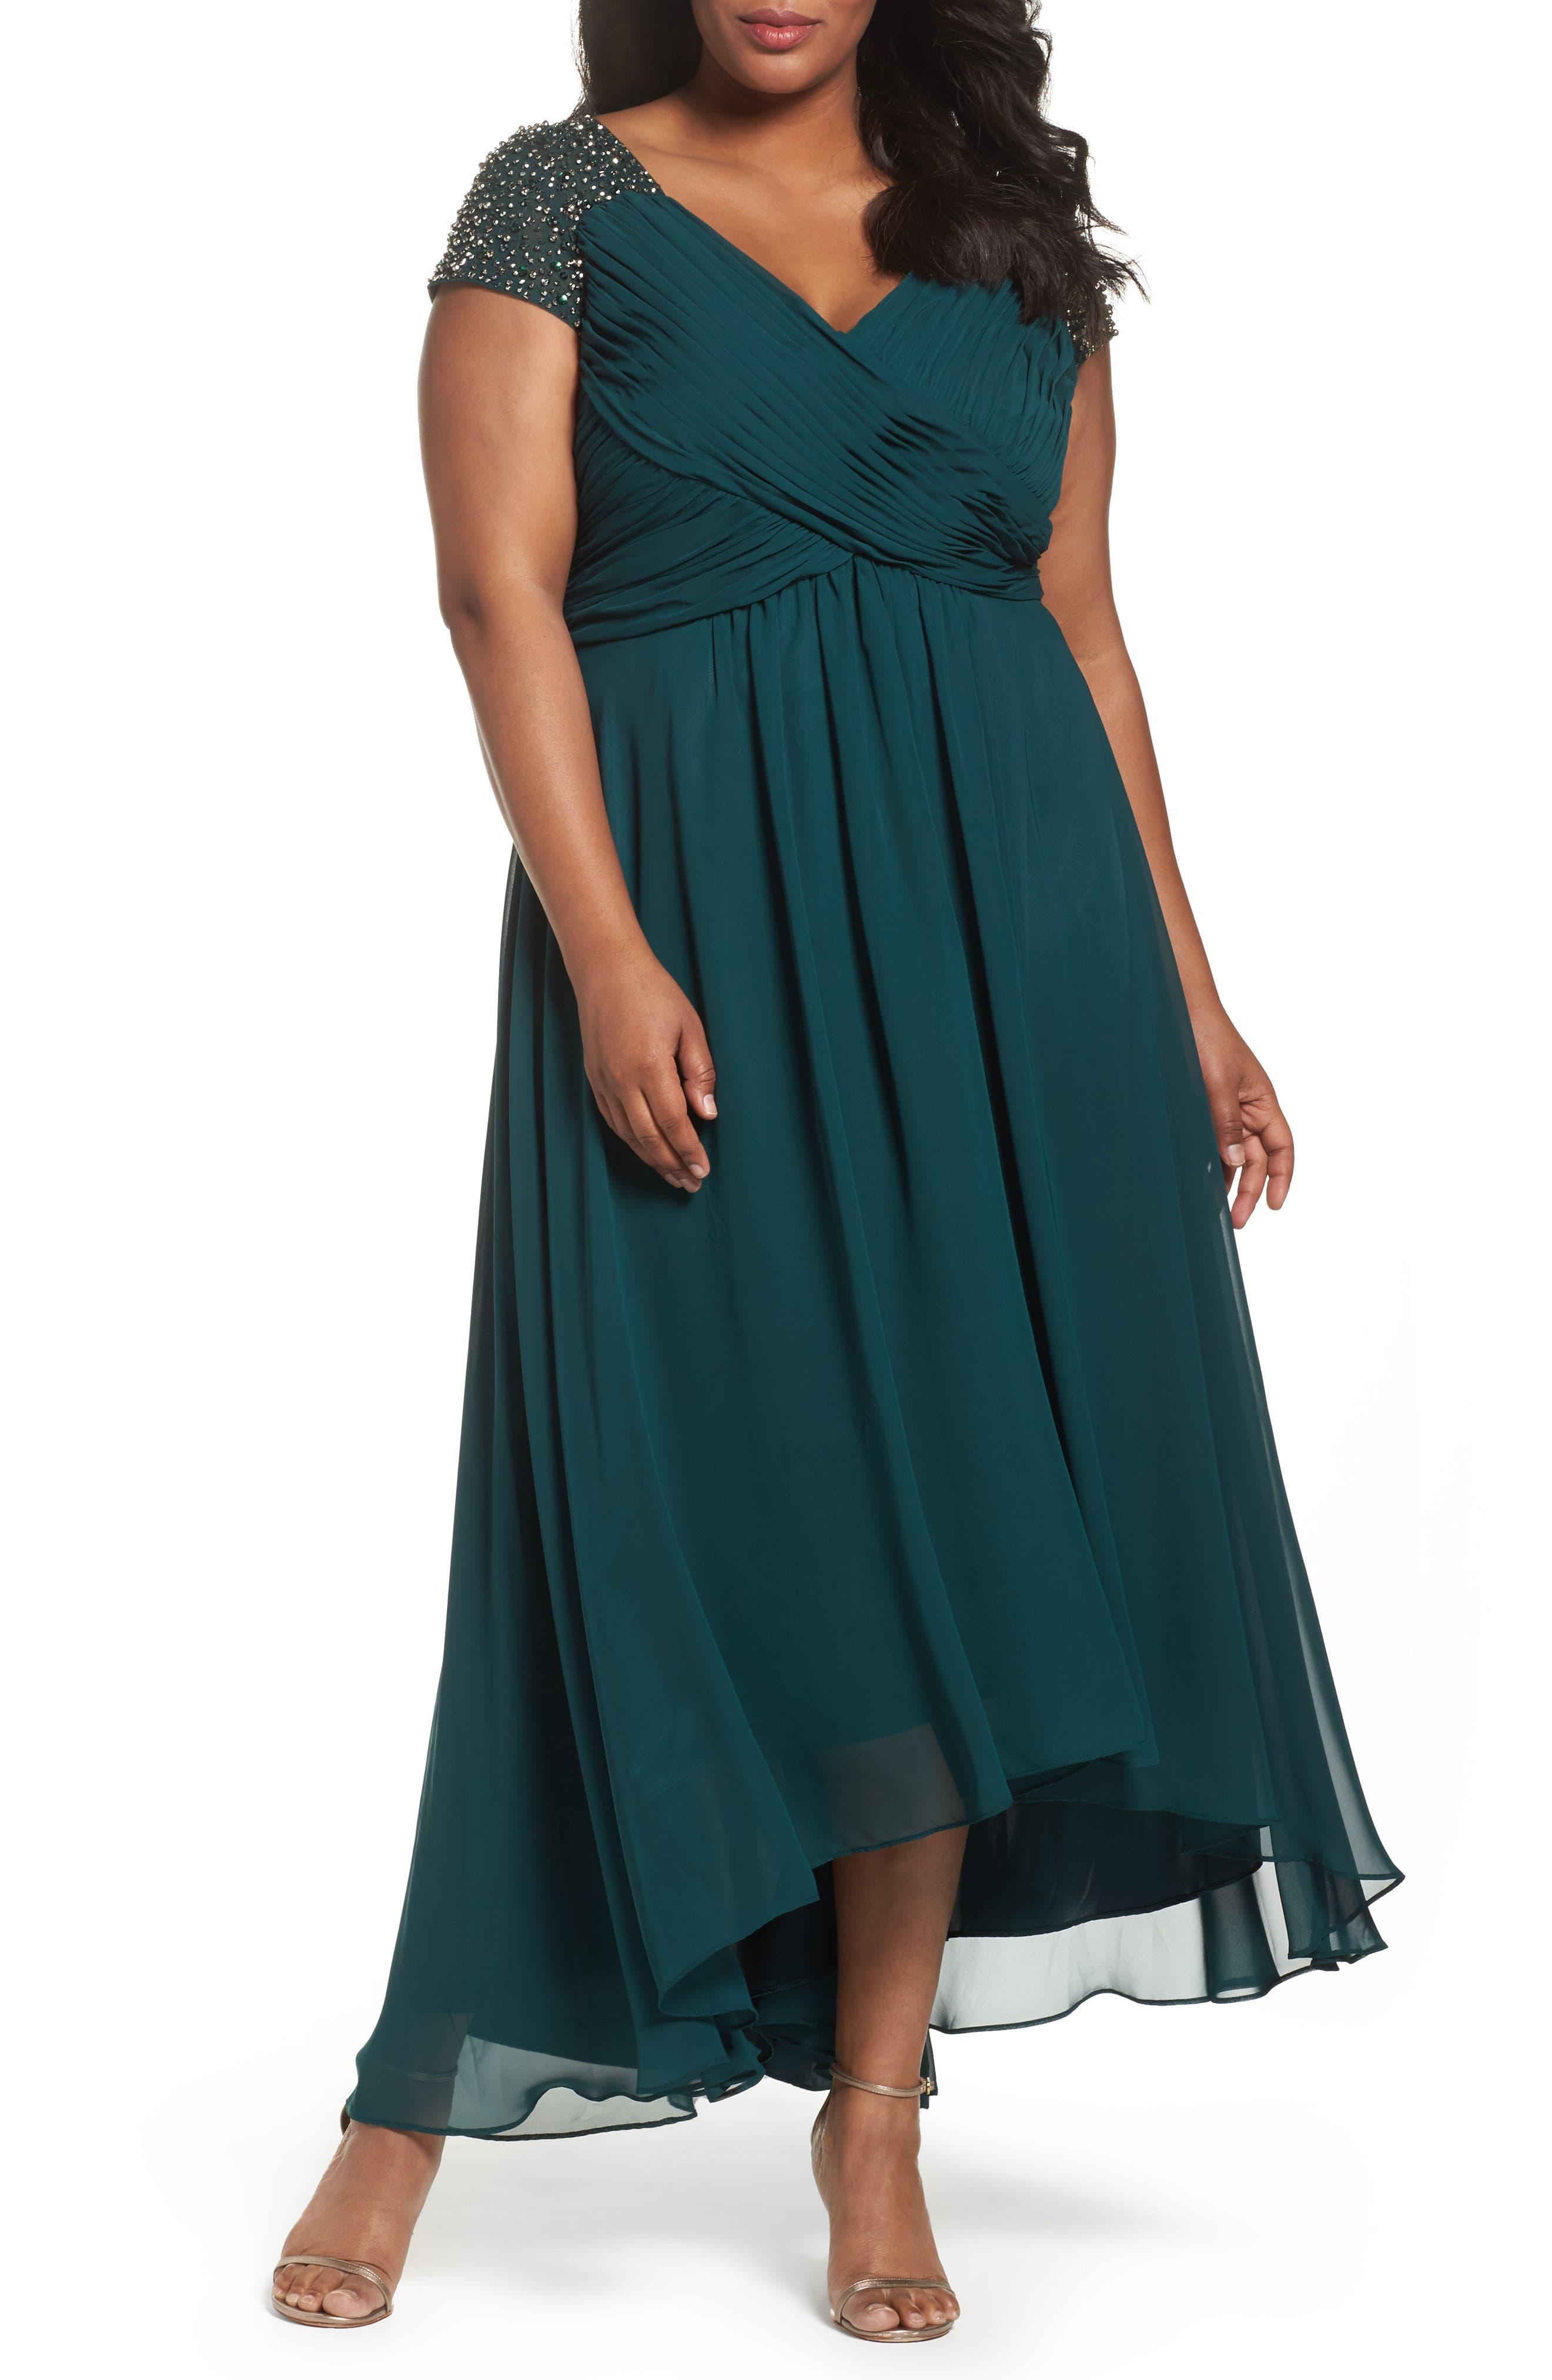 Alternate Image 1 Selected - Eliza J Embellished Pleated Chiffon Gown (Plus Size)